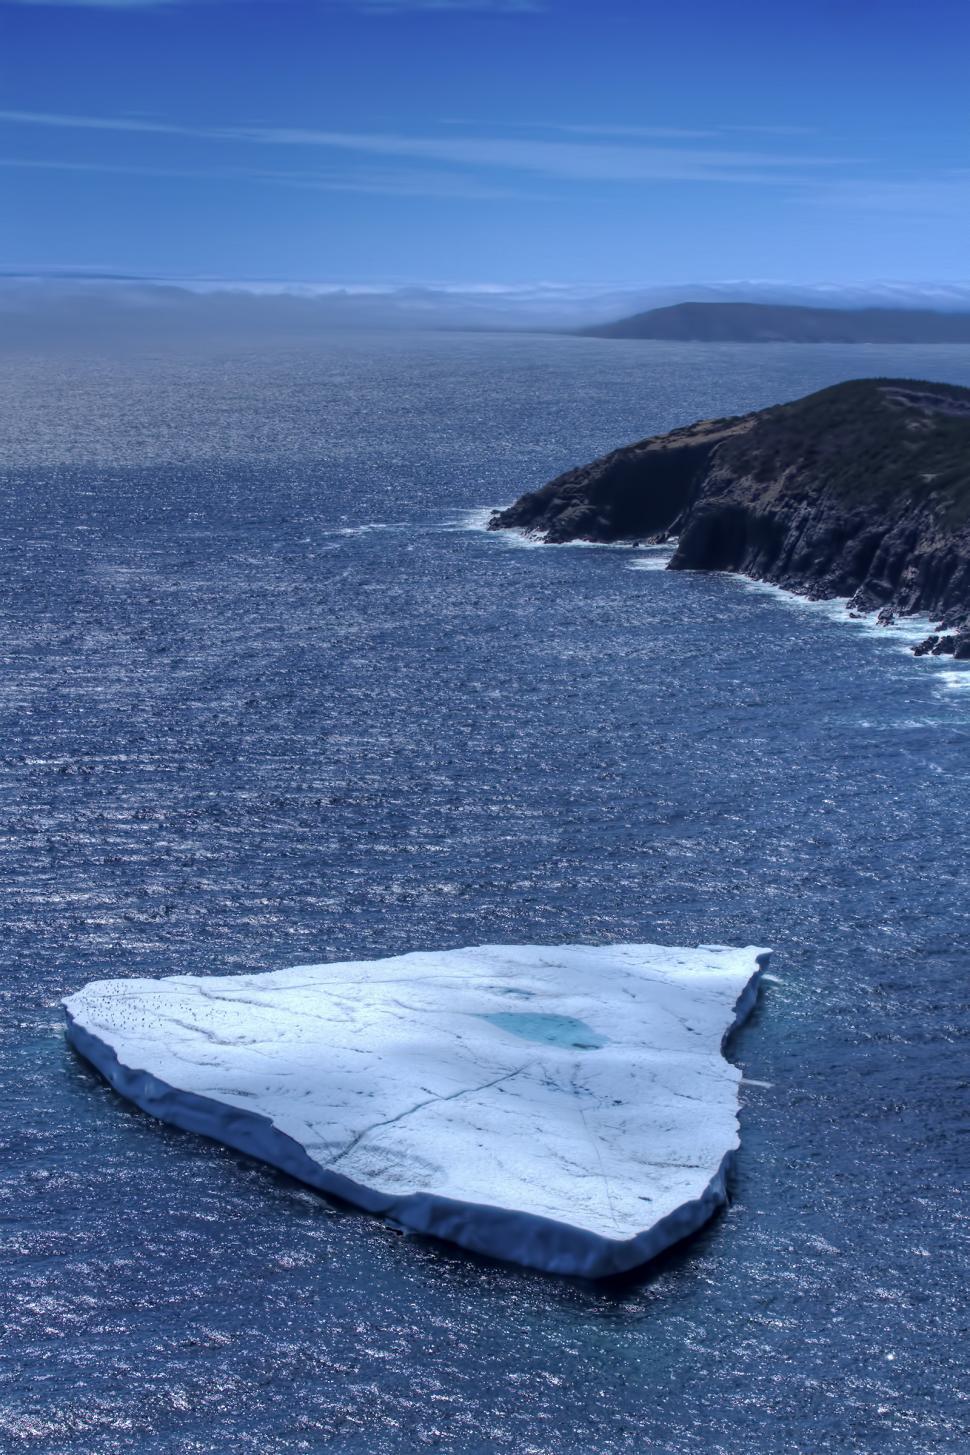 Download Free Stock HD Photo of iceberg Online